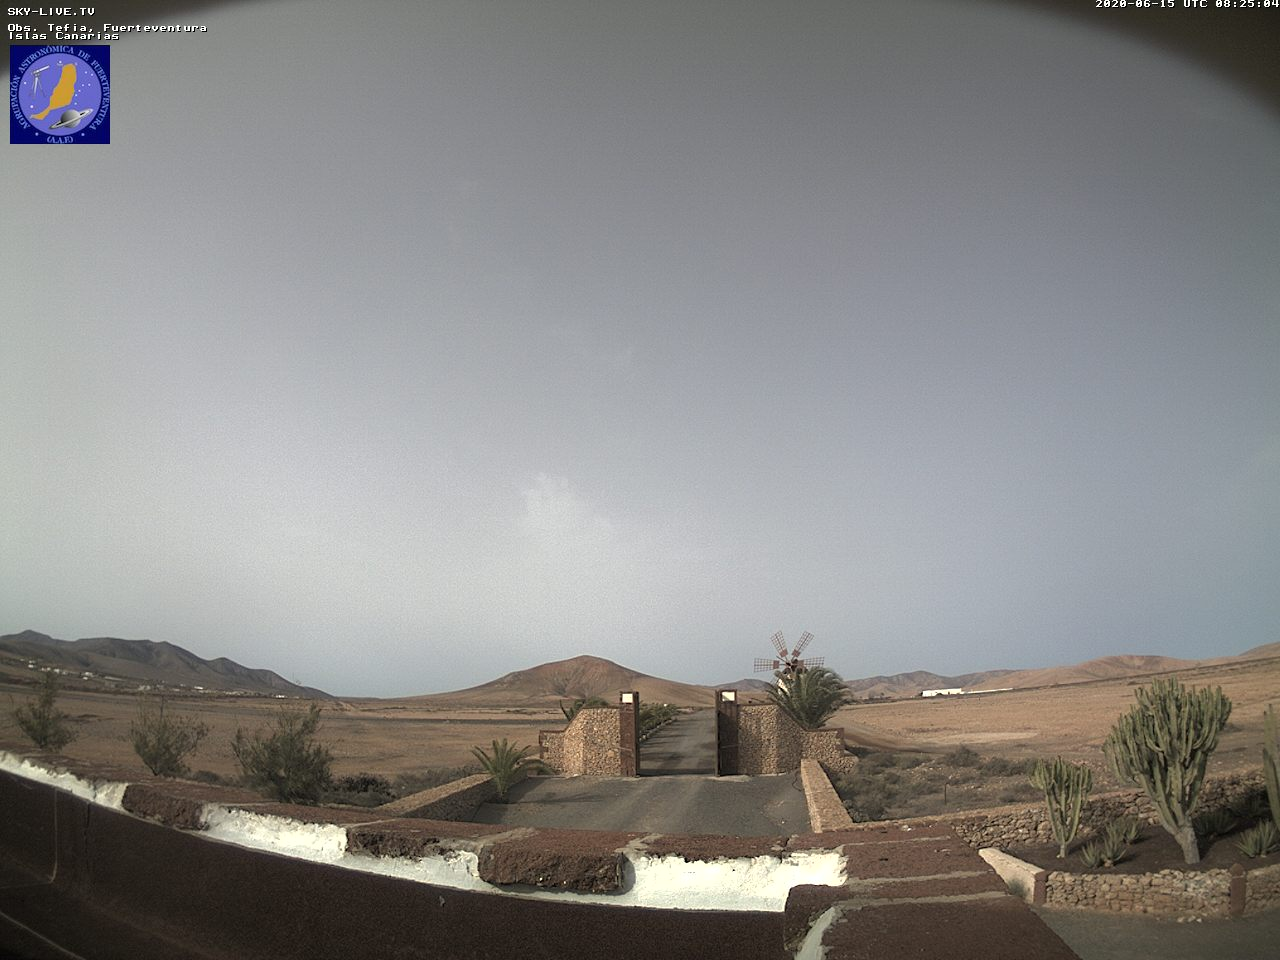 Observatorio Fuerteventura